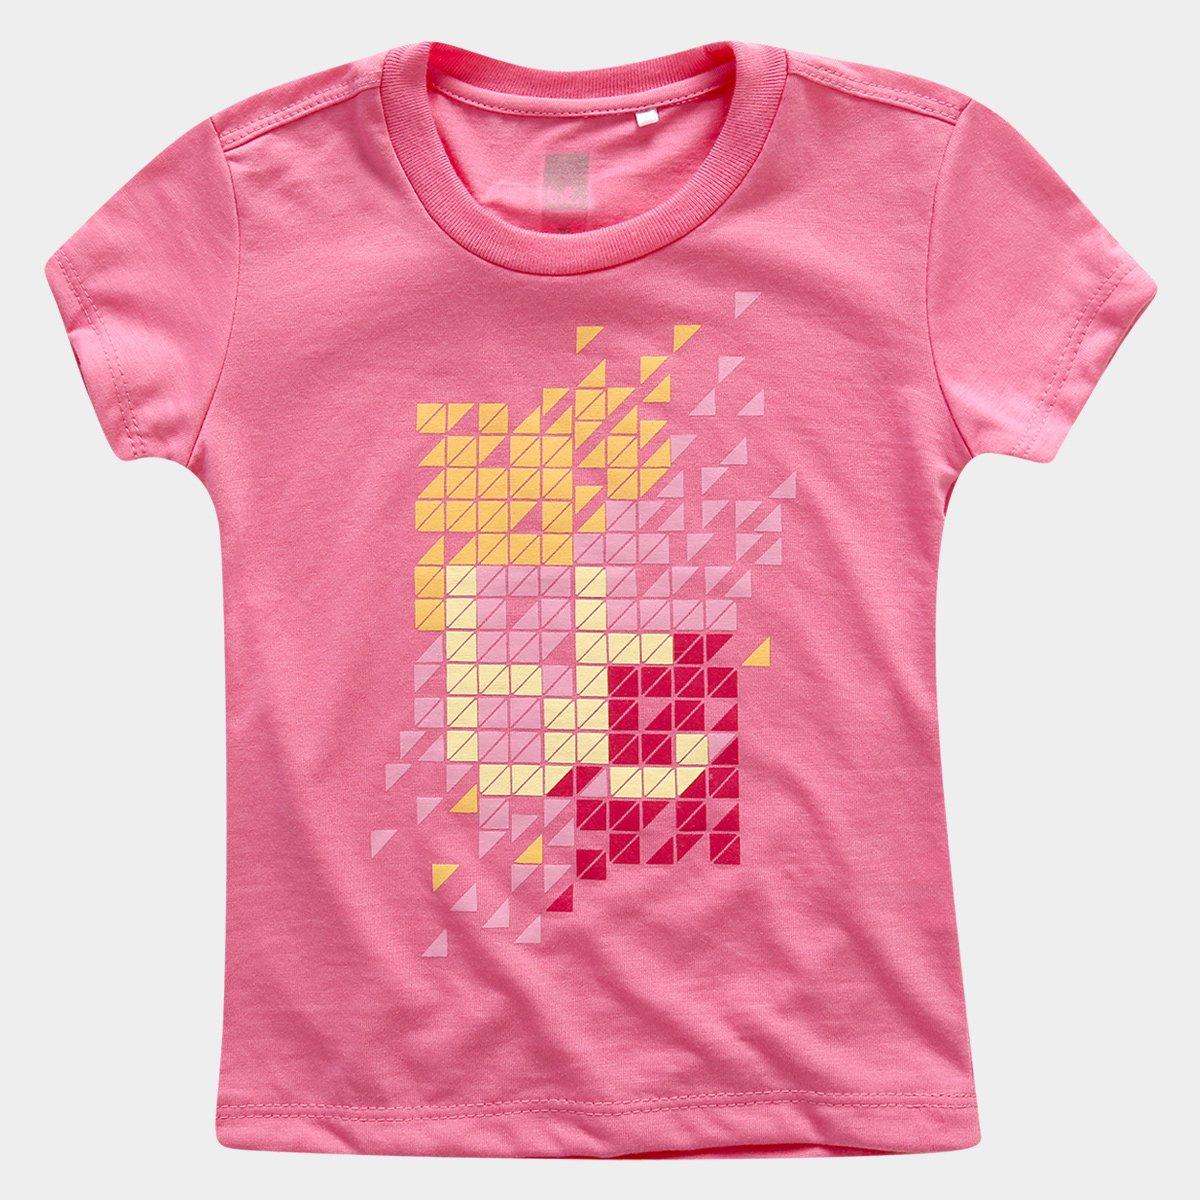 Camiseta Rosa Infantil Outfit Camiseta Bodytech Bt Bt Basic dpROdZ